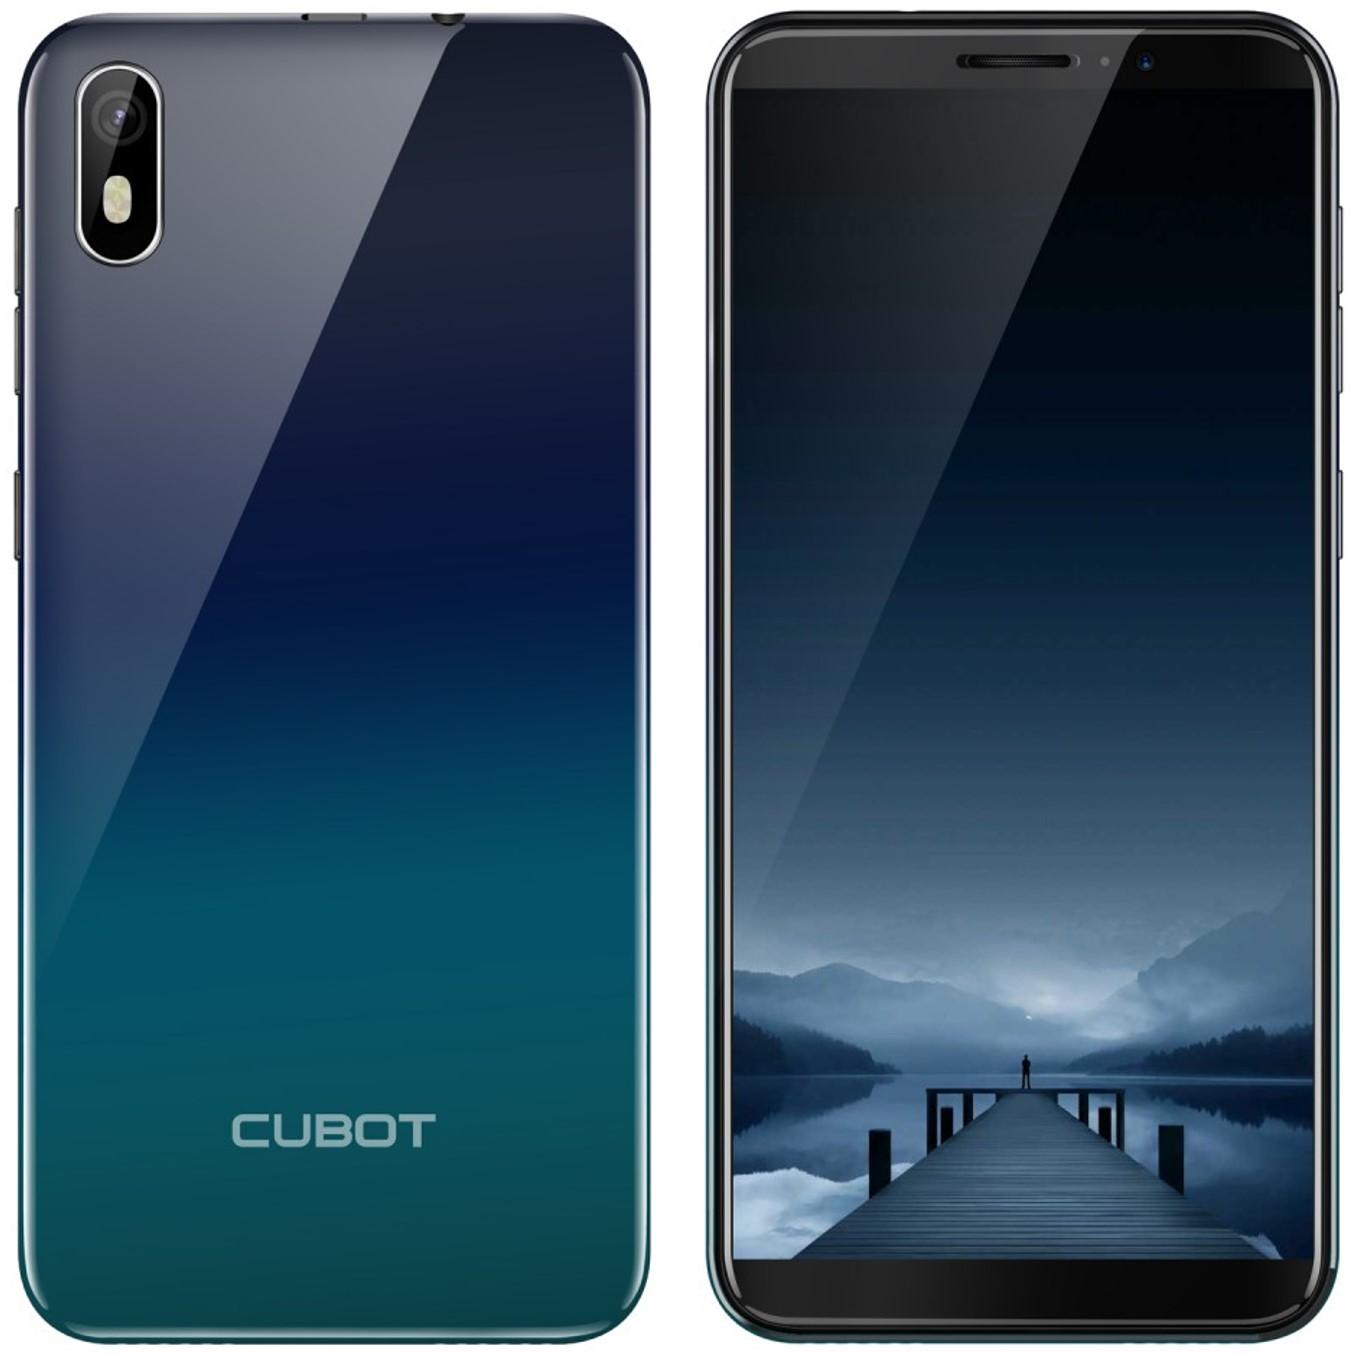 Telefono movil smartphone cubot j5 gradiente - 5.5